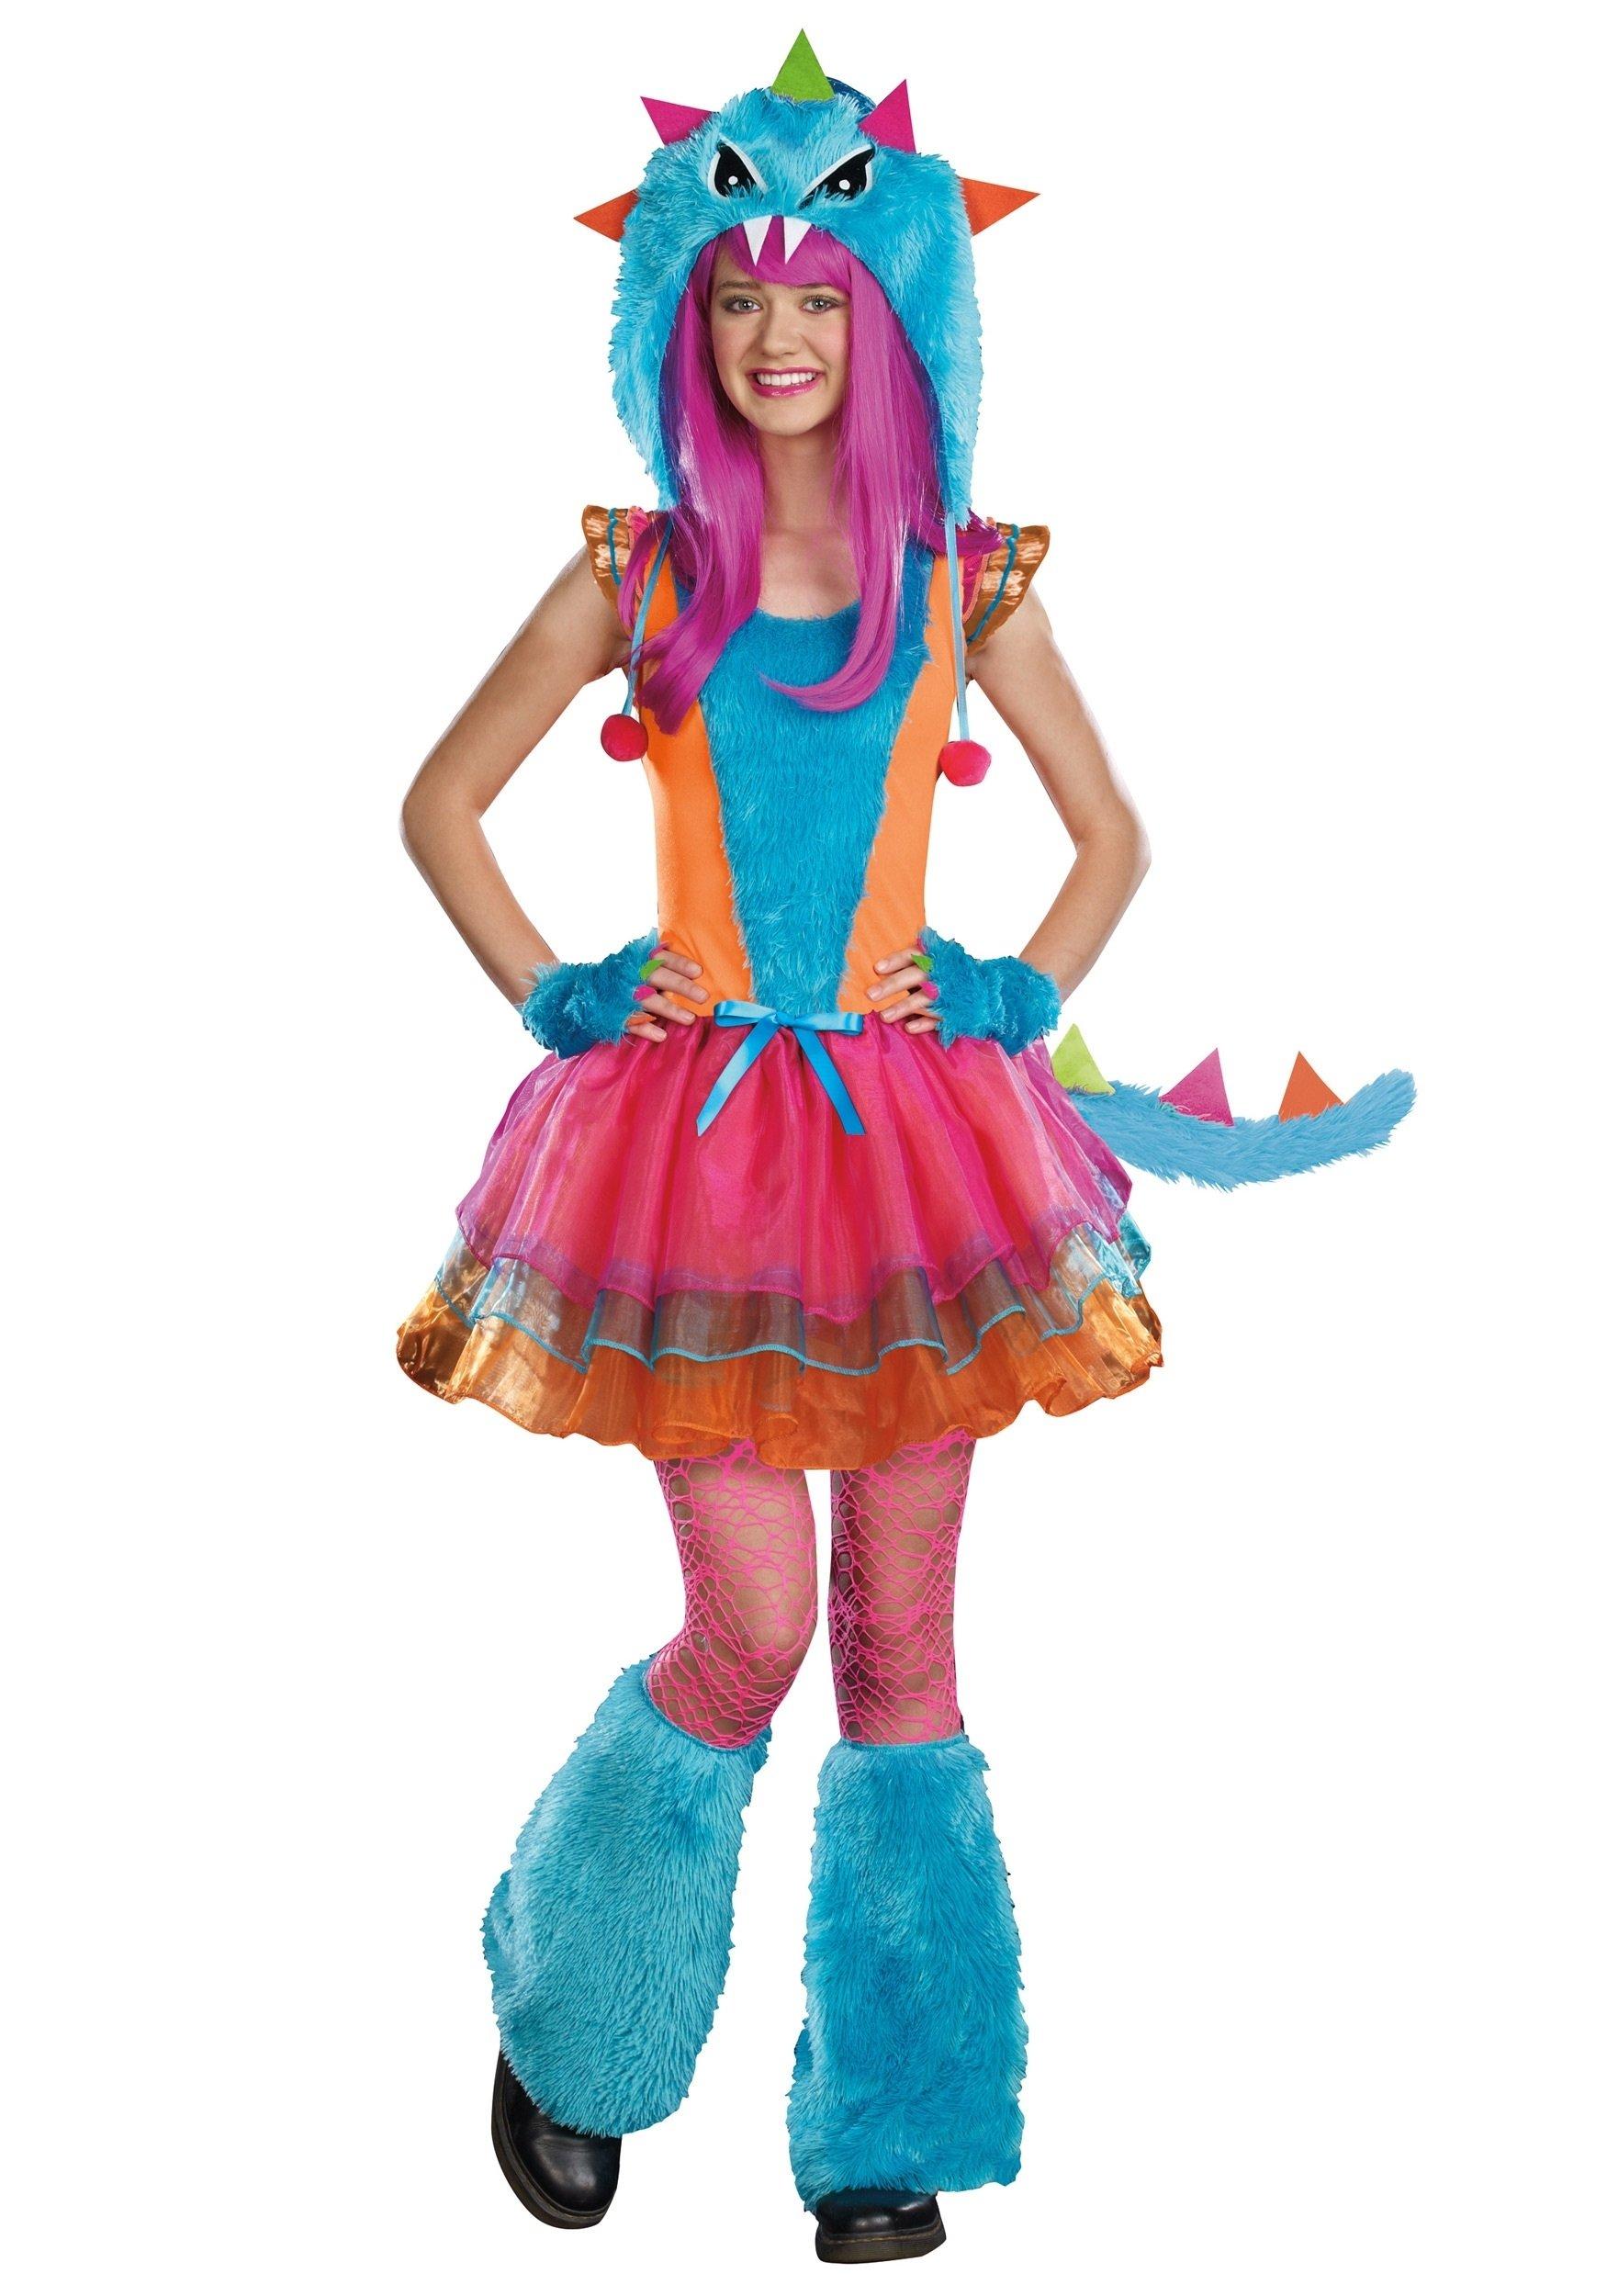 10 Beautiful Cute Costume Ideas For Girls teen ferocious monster costume 2021